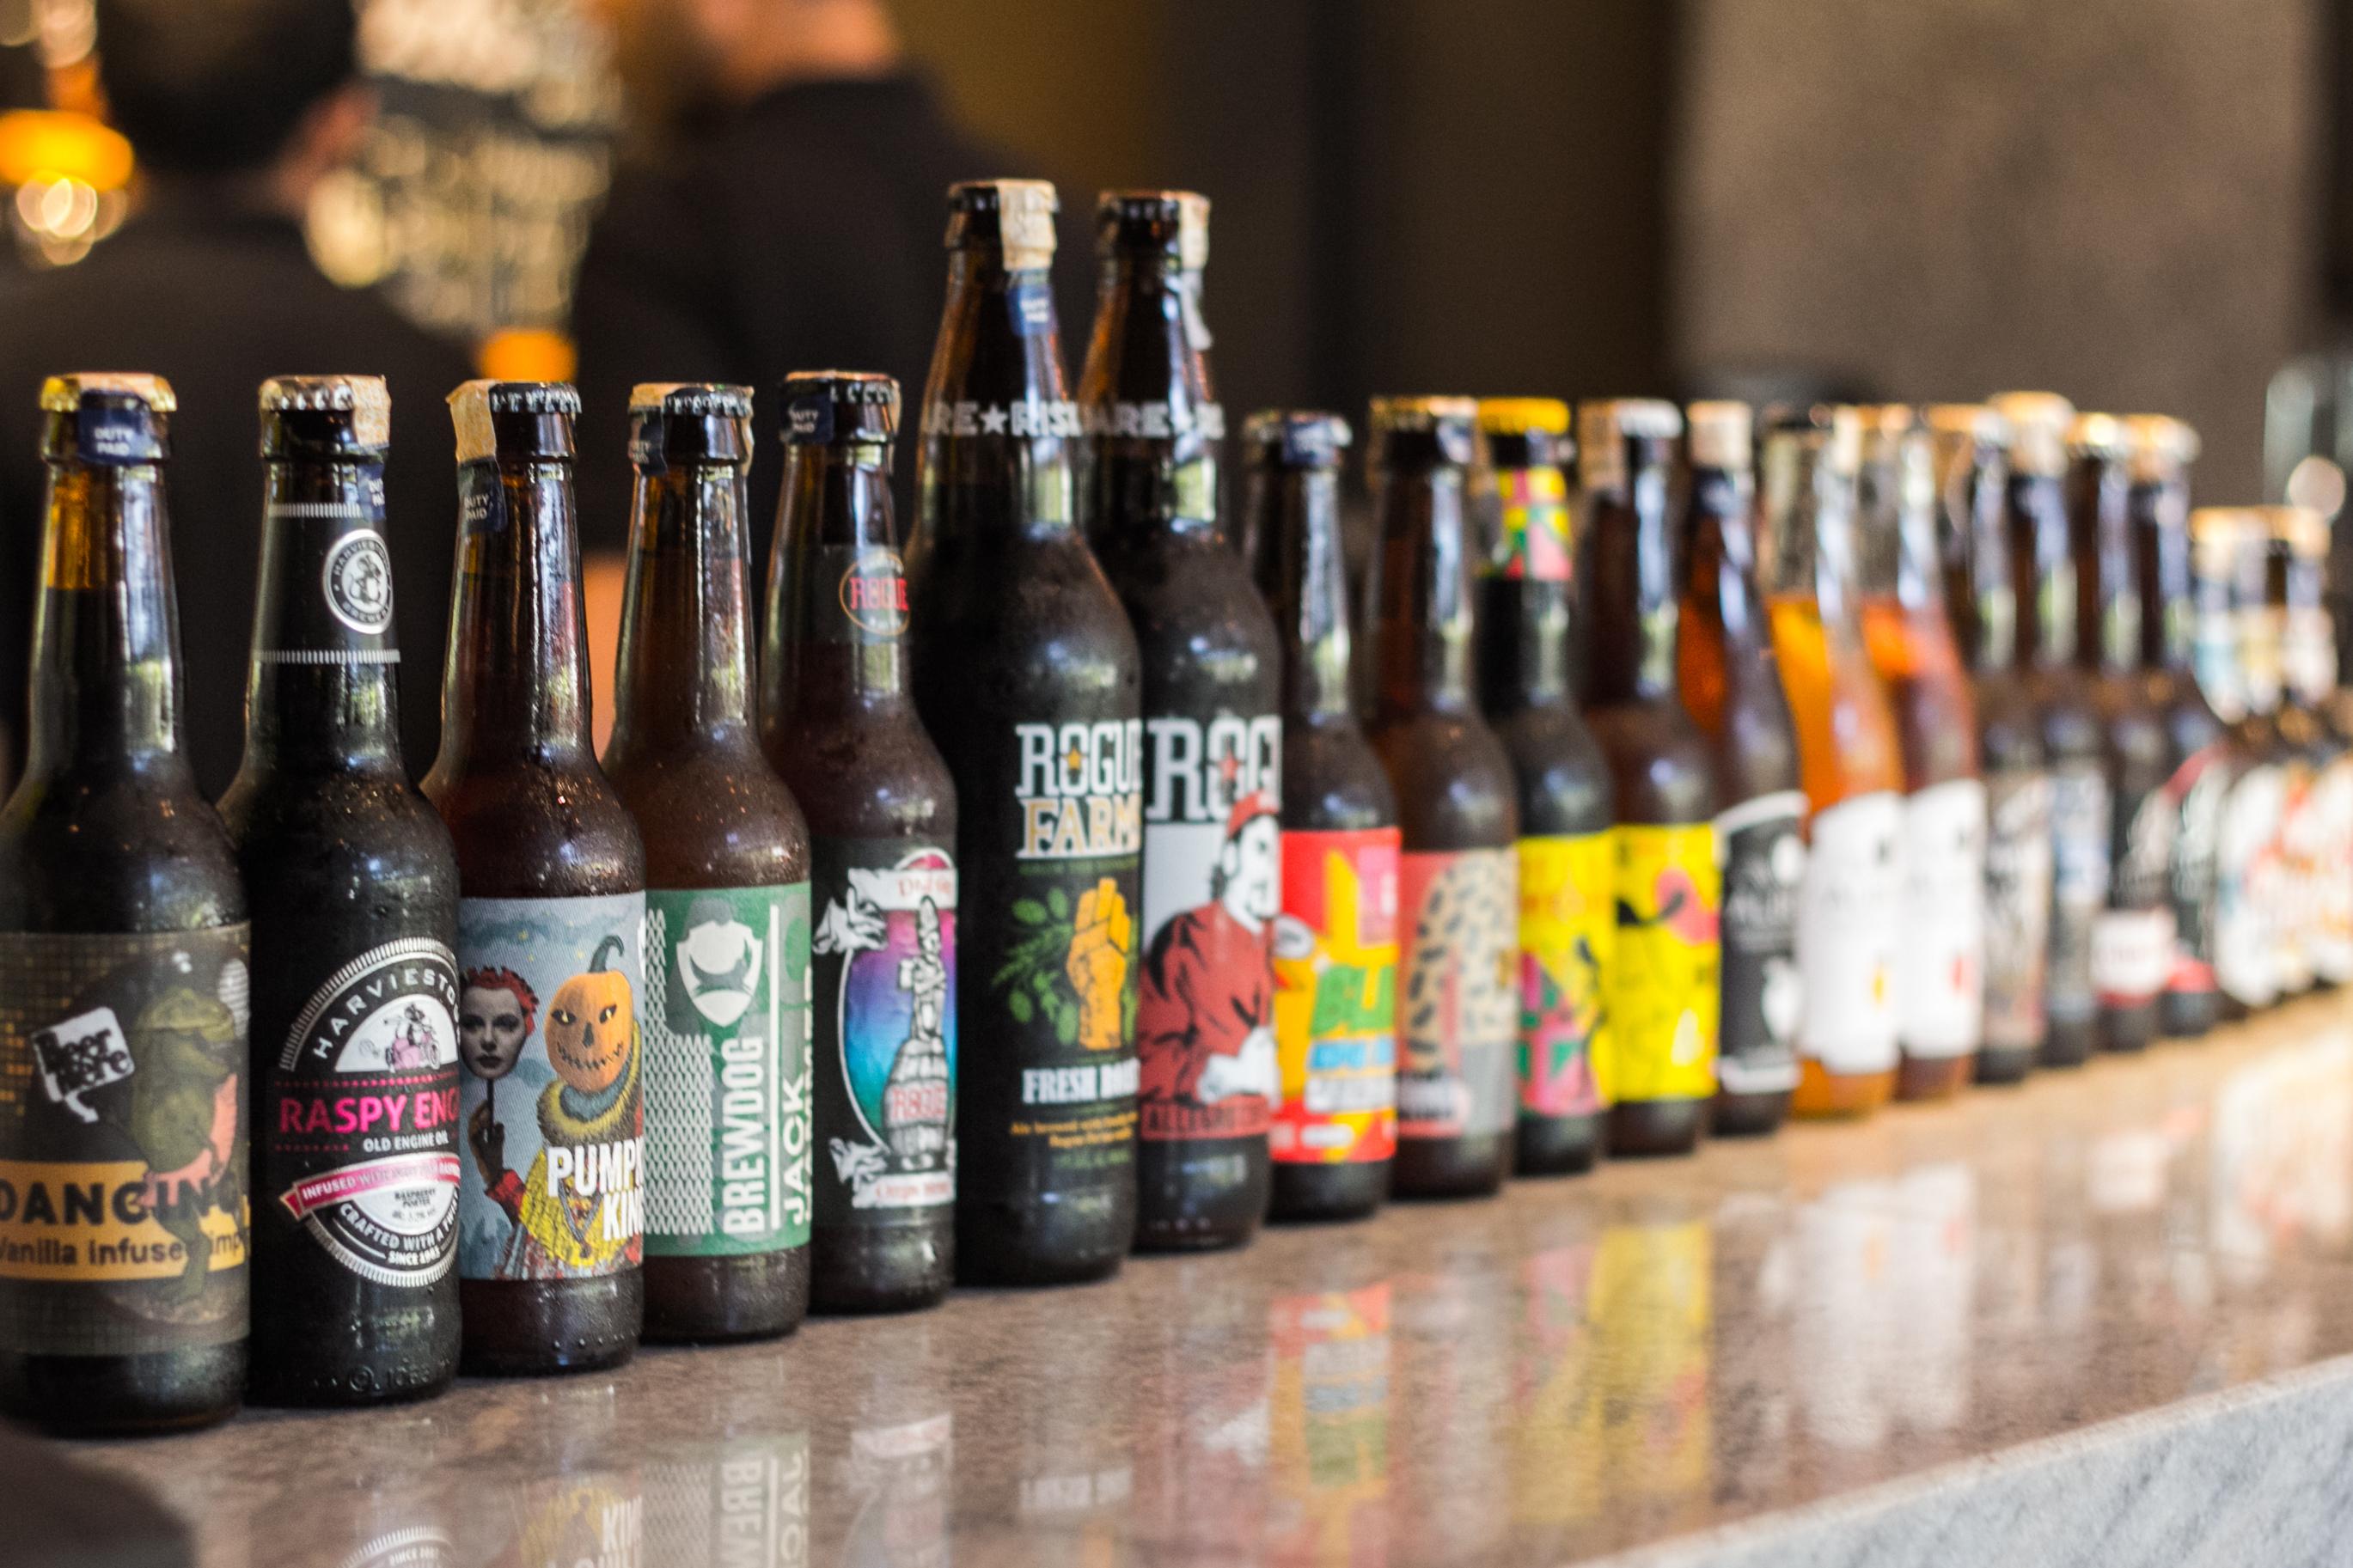 Taps Beer Bar Pop Up Craft Beer Bar